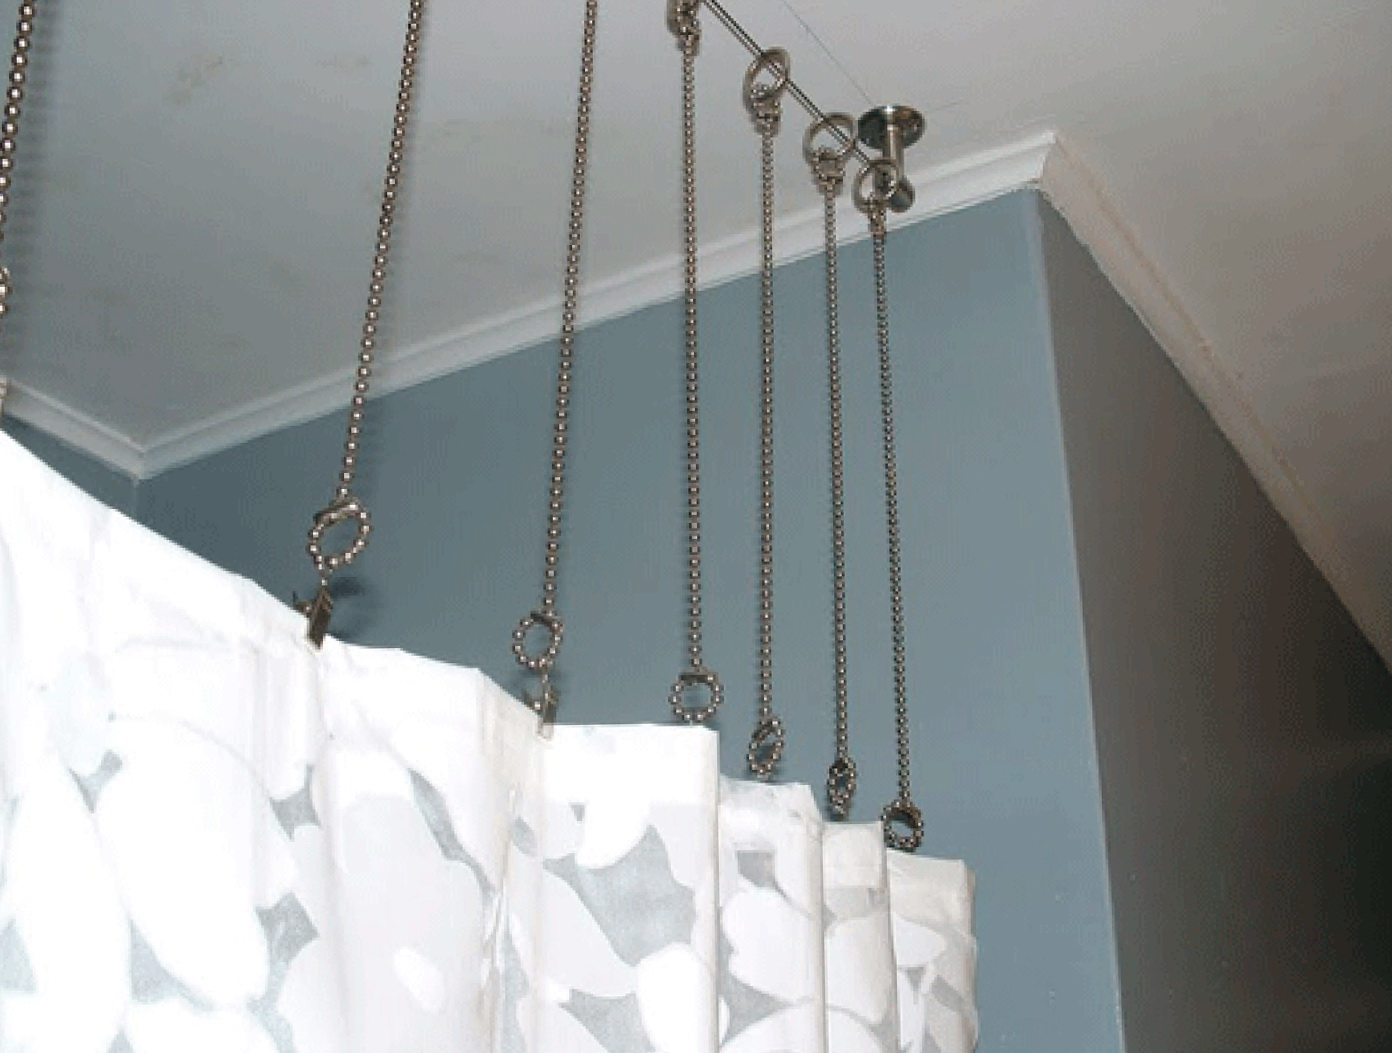 Ceiling Mount Shower Curtain Rod | Home Design Ideas